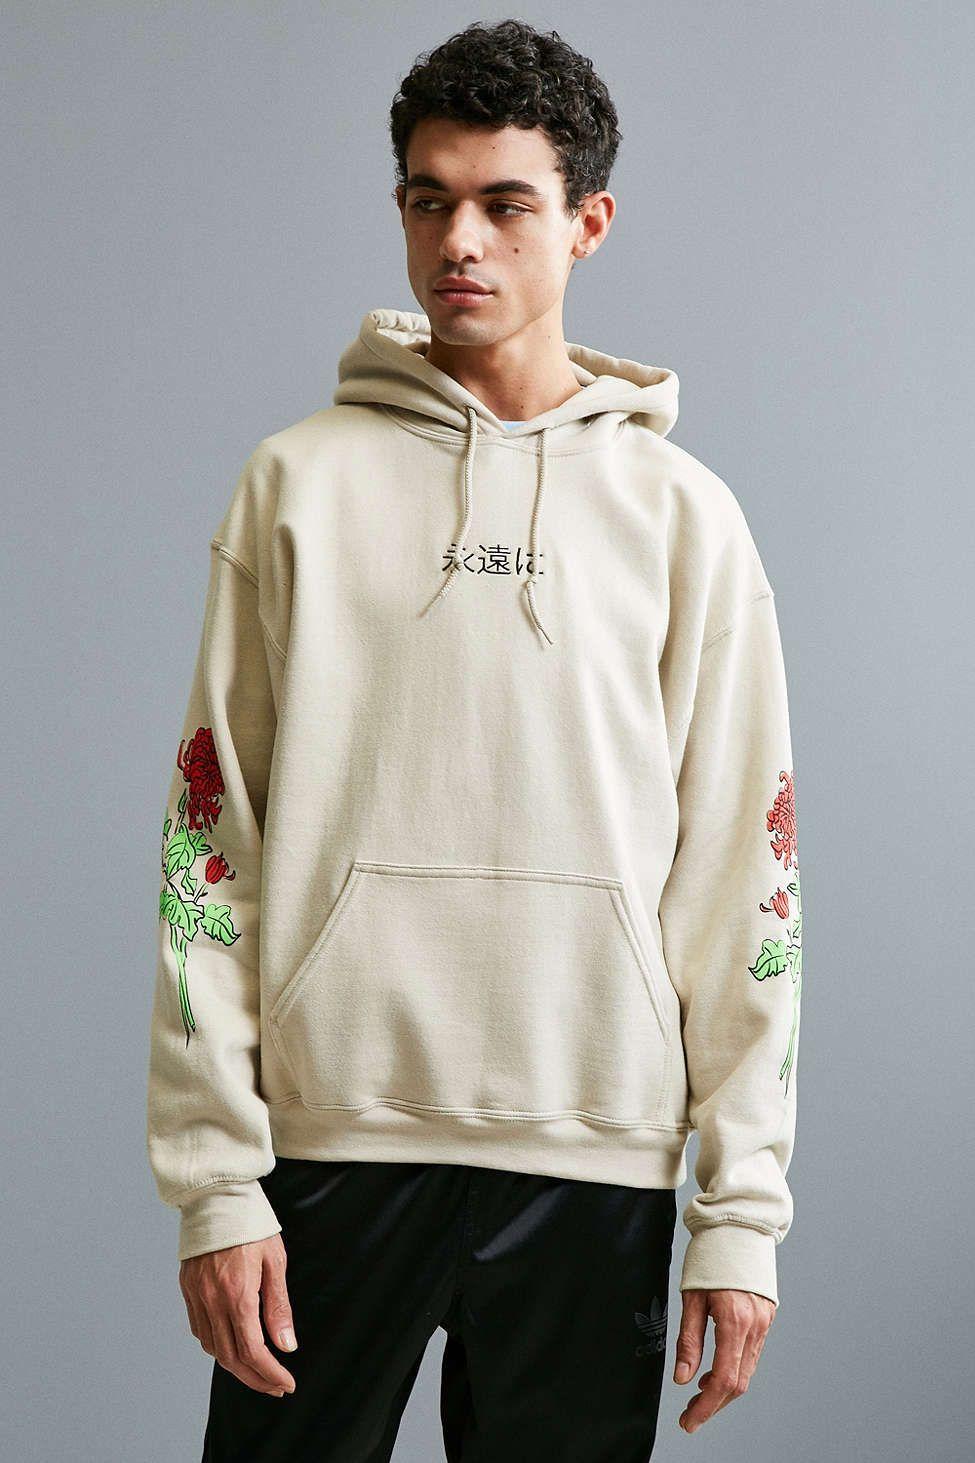 54f5a00fde150b Floral Days Hoodie Sweatshirt